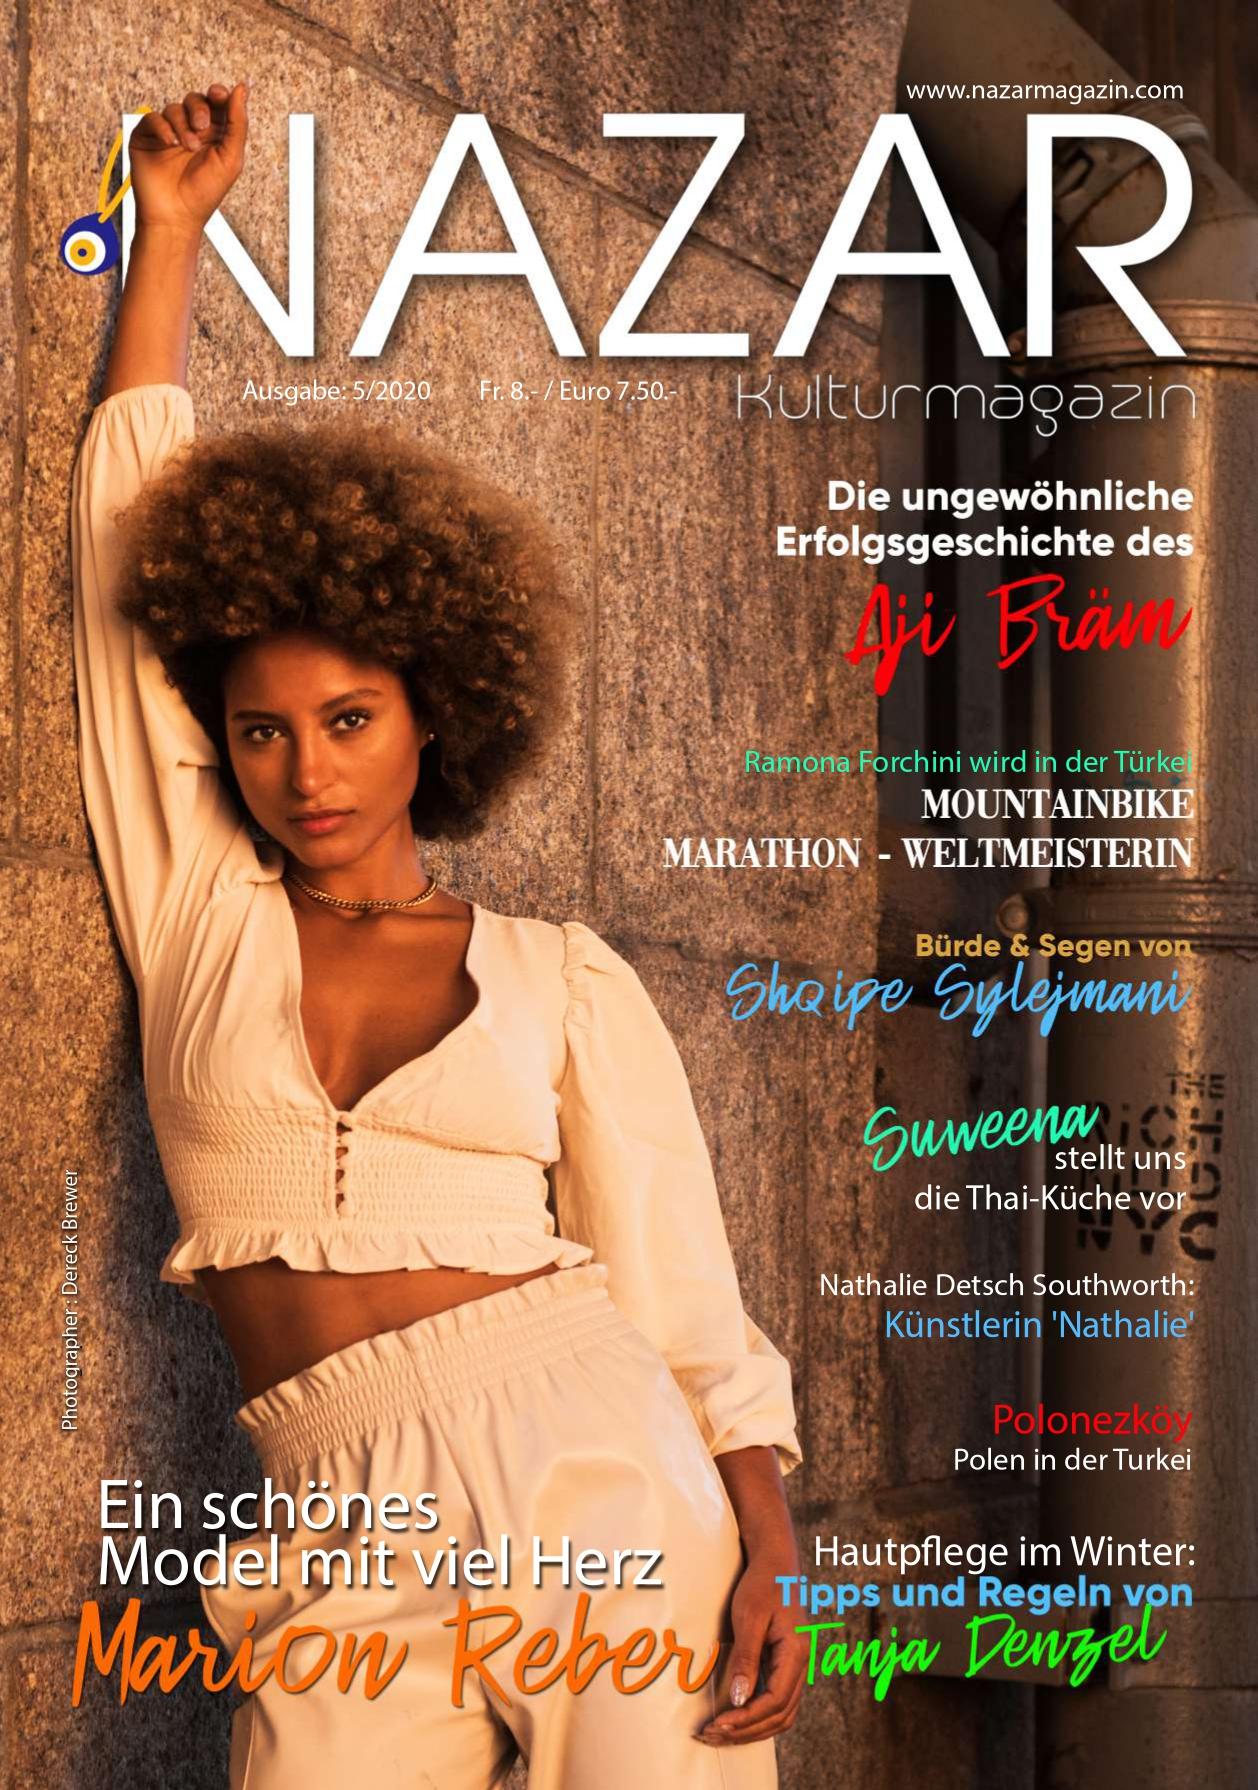 Nazar-Kultur-Magazin-Dezember-2020